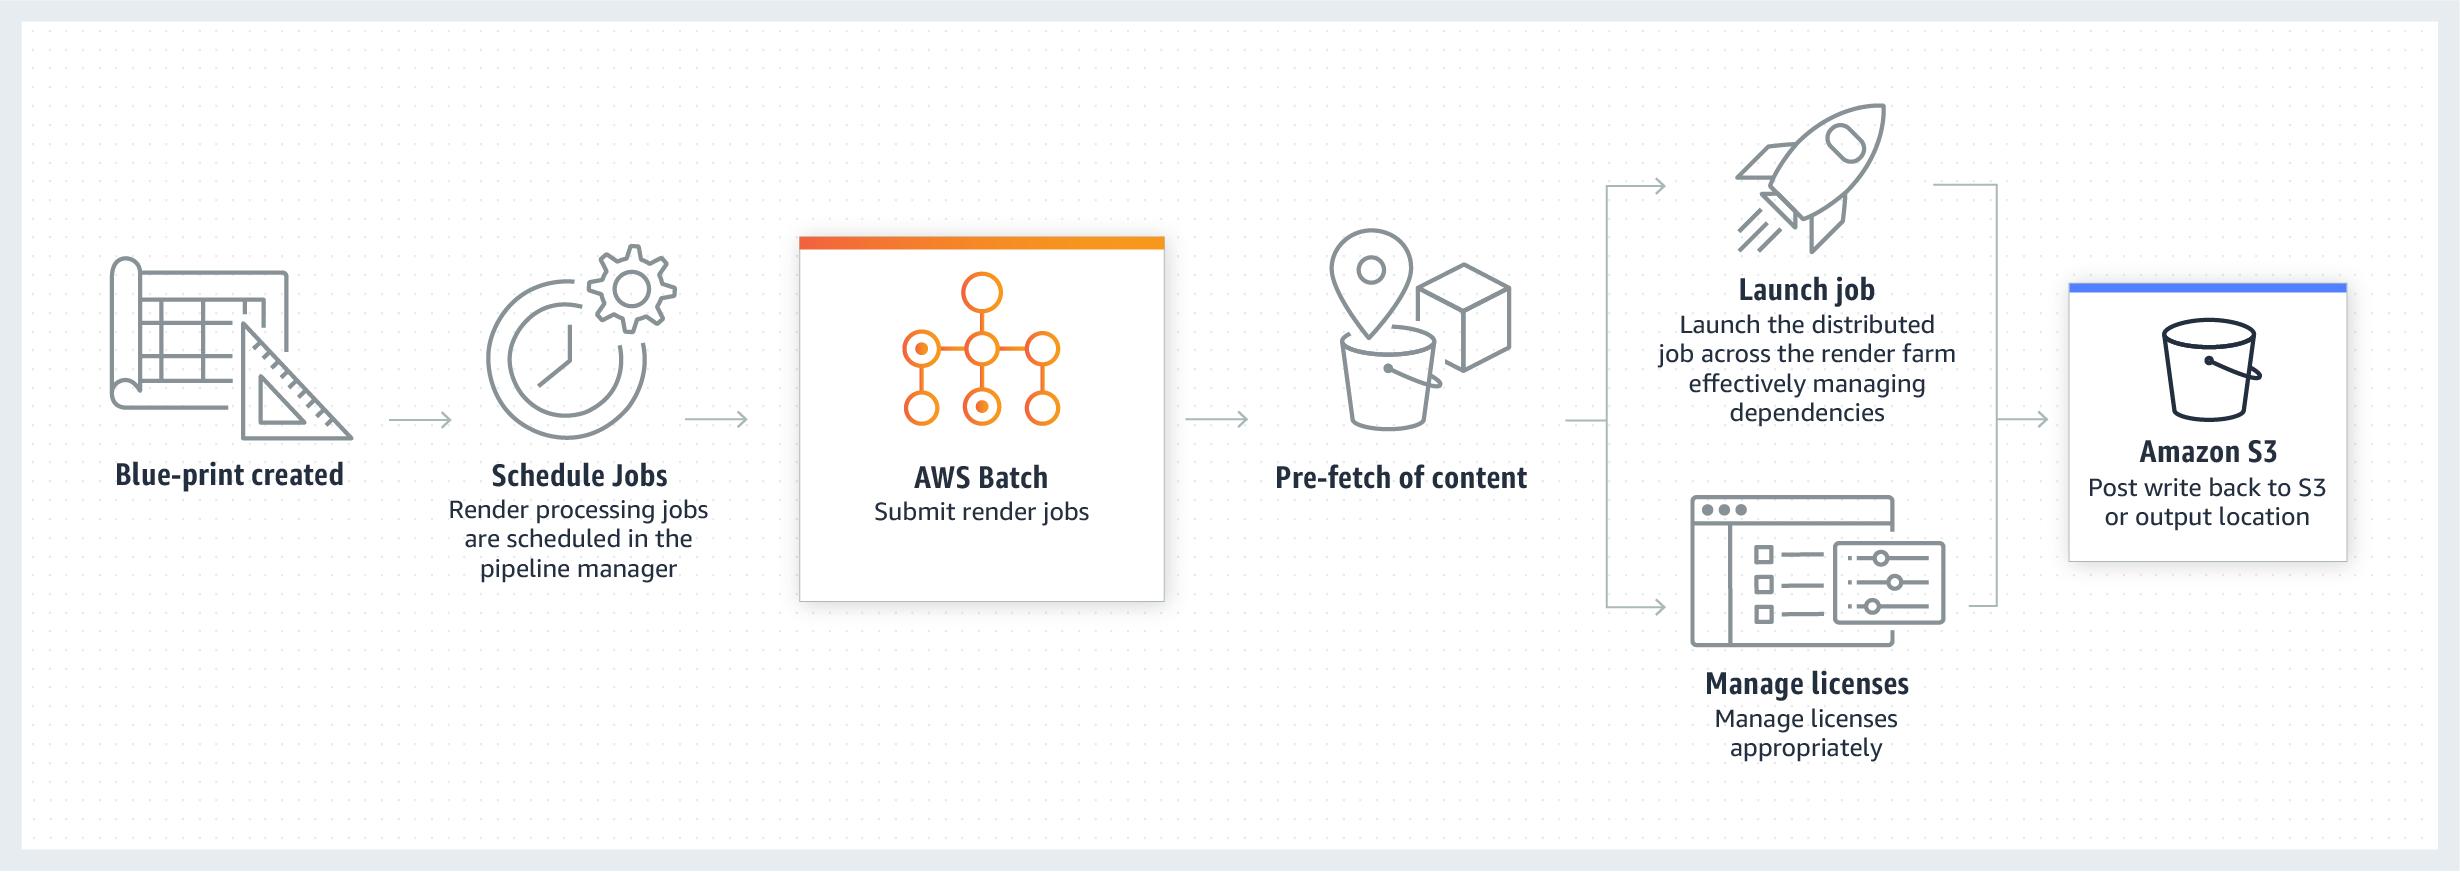 product-page-diagram-AWS-Batch_digital-media-1